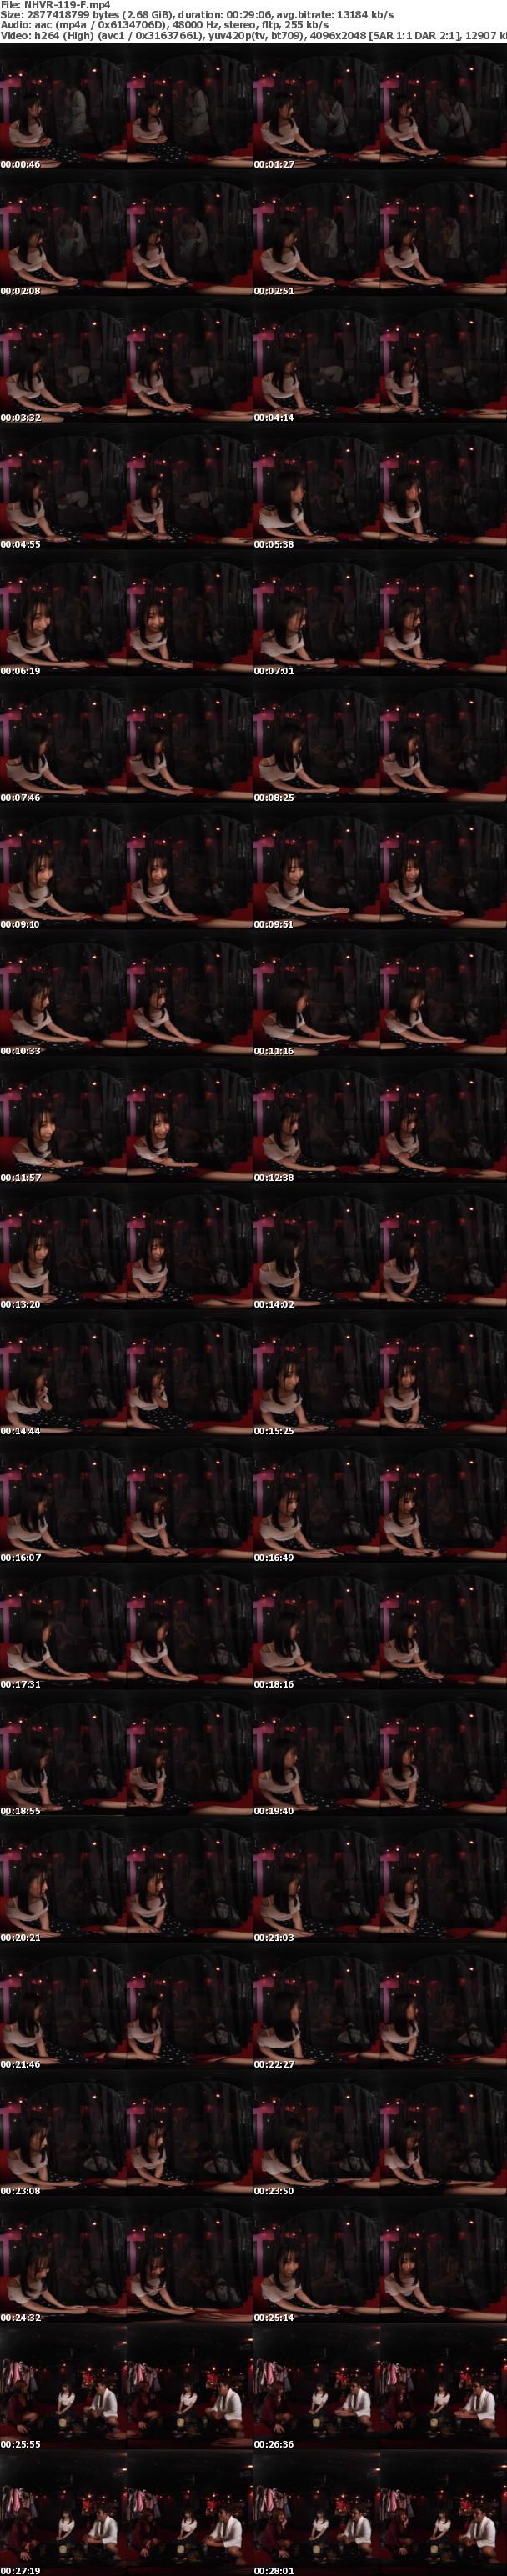 (VR) NHVR-119 歌舞伎町C店全面協力!本物店舗で撮影した超リアルハプニングバー体験 VR ~ハプバーの女神つむぎちゃんを落とすのは誰だ!?~